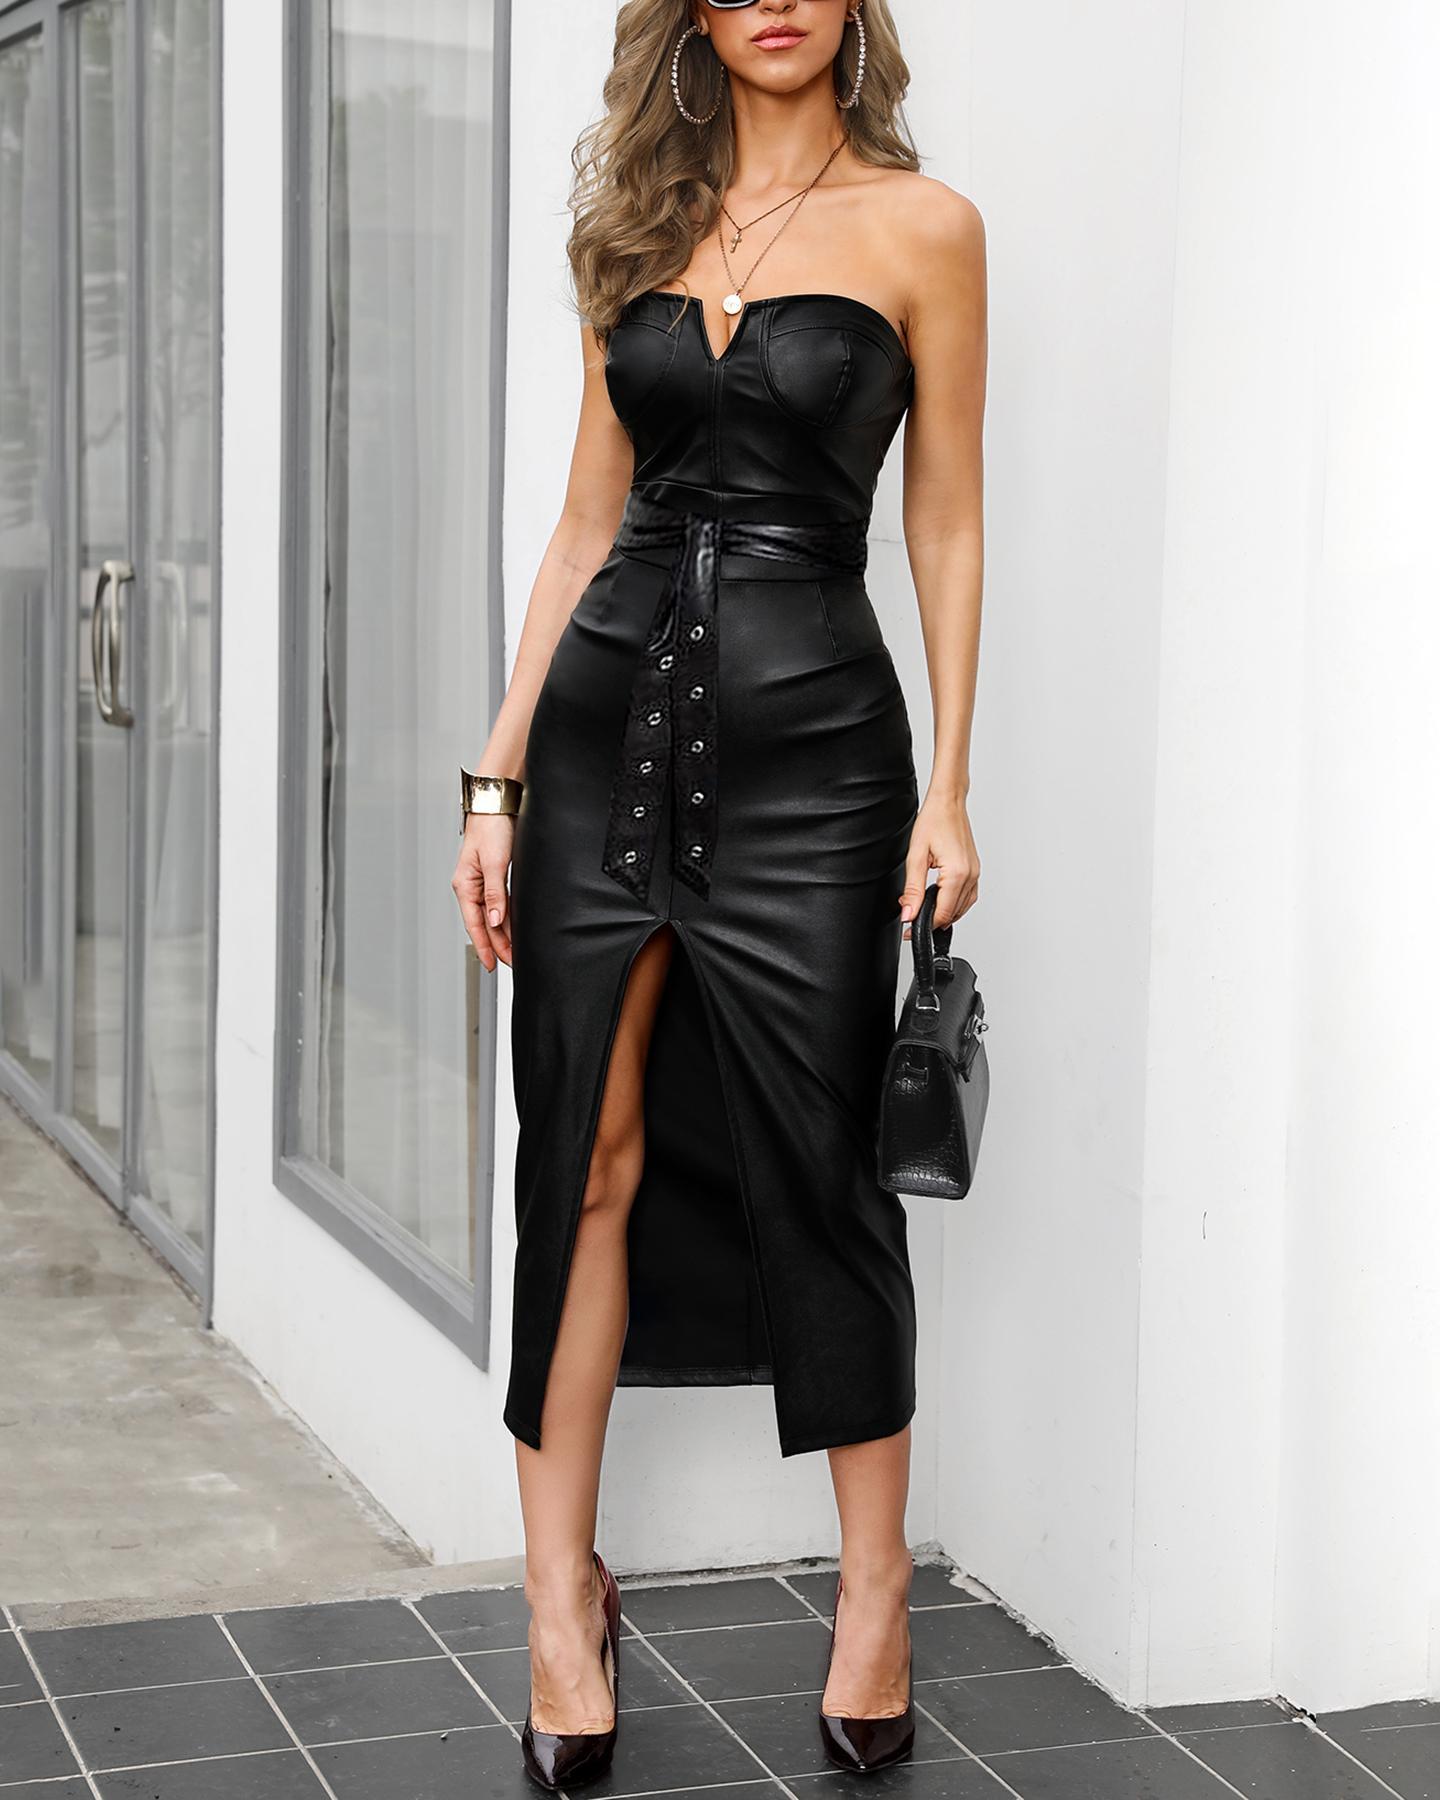 chicme / Solid Tube Slit Coated PU Leather Dress